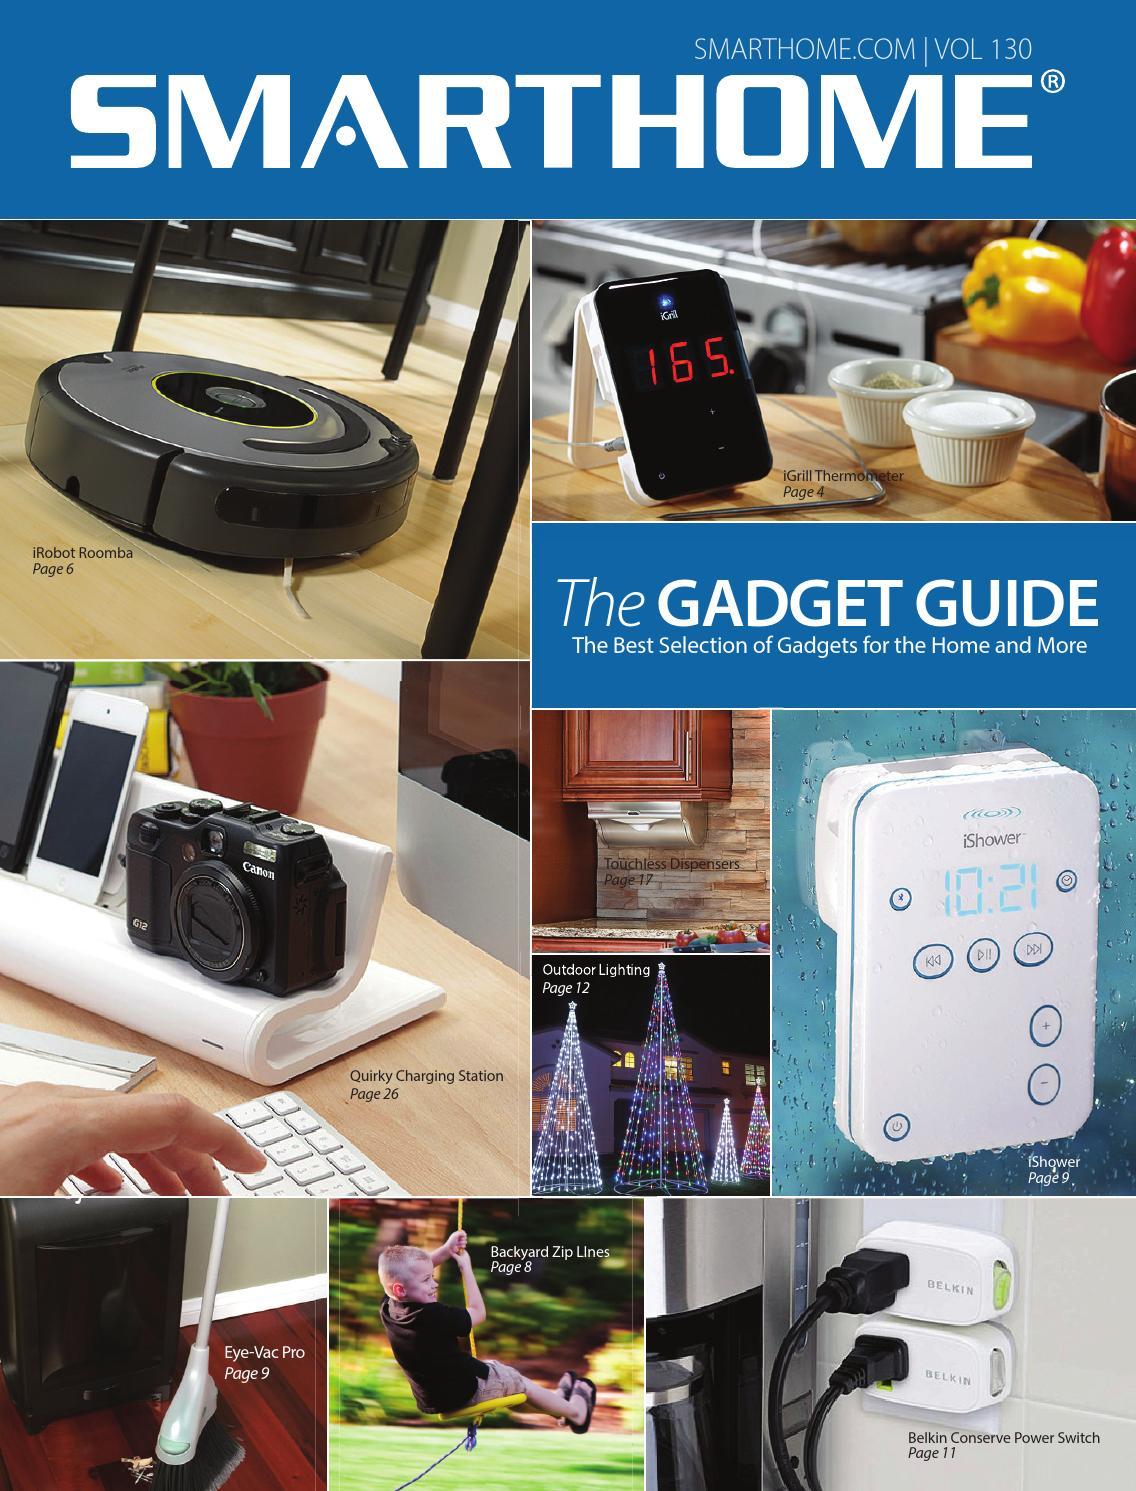 smarthome catalog vol 130 by smarthome issuu. Black Bedroom Furniture Sets. Home Design Ideas